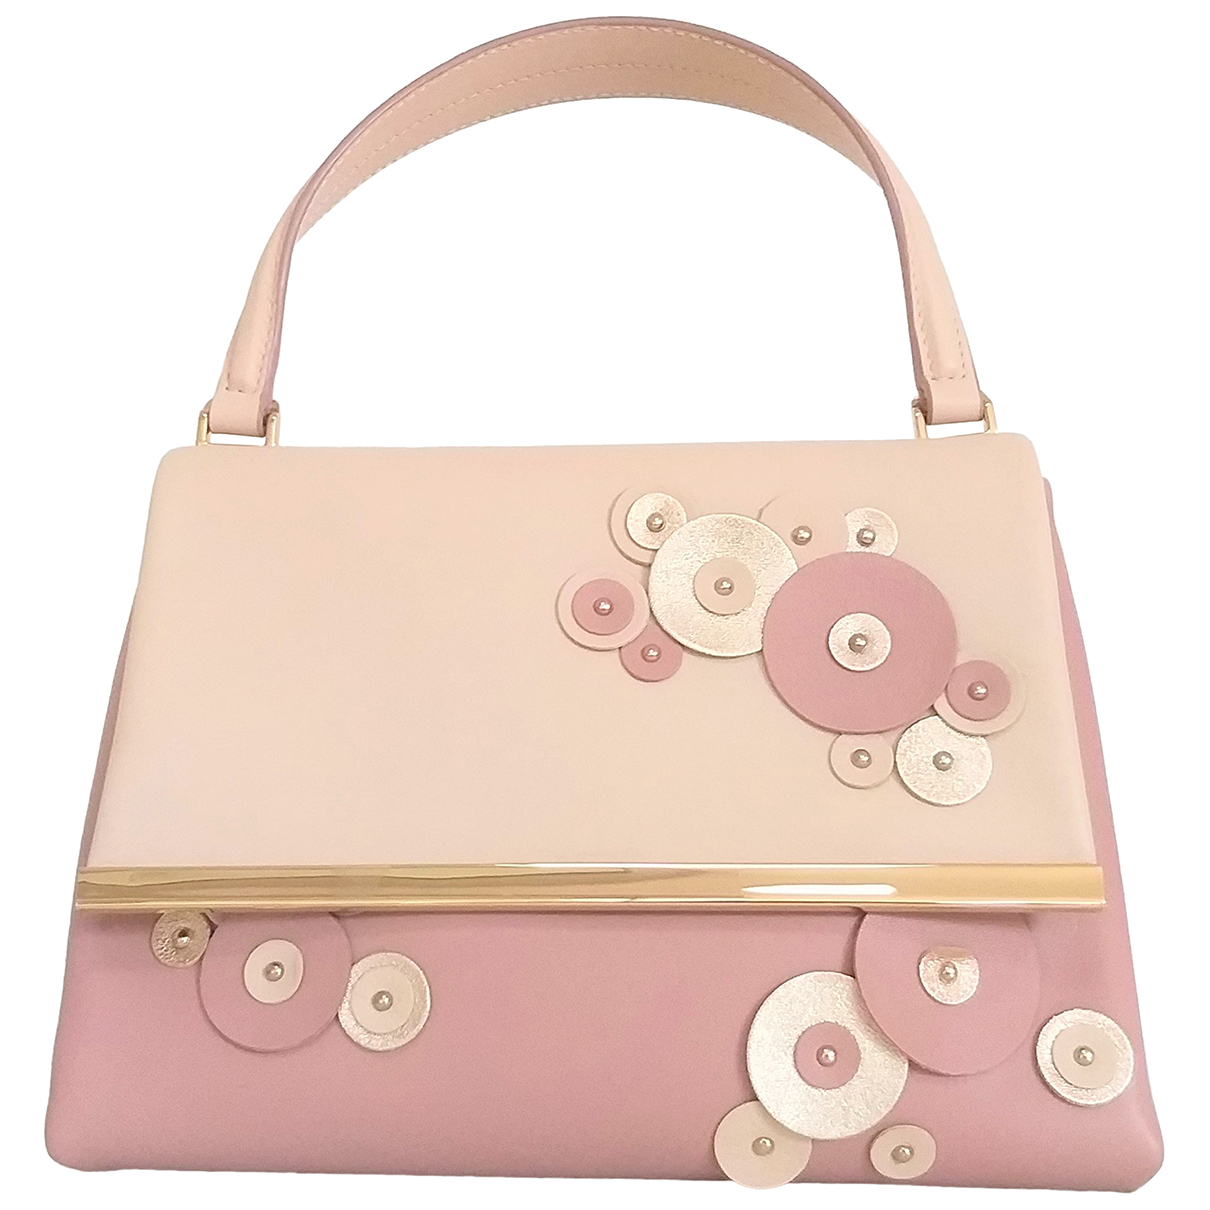 Carolina Herrera \N Pink Leather handbag for Women \N